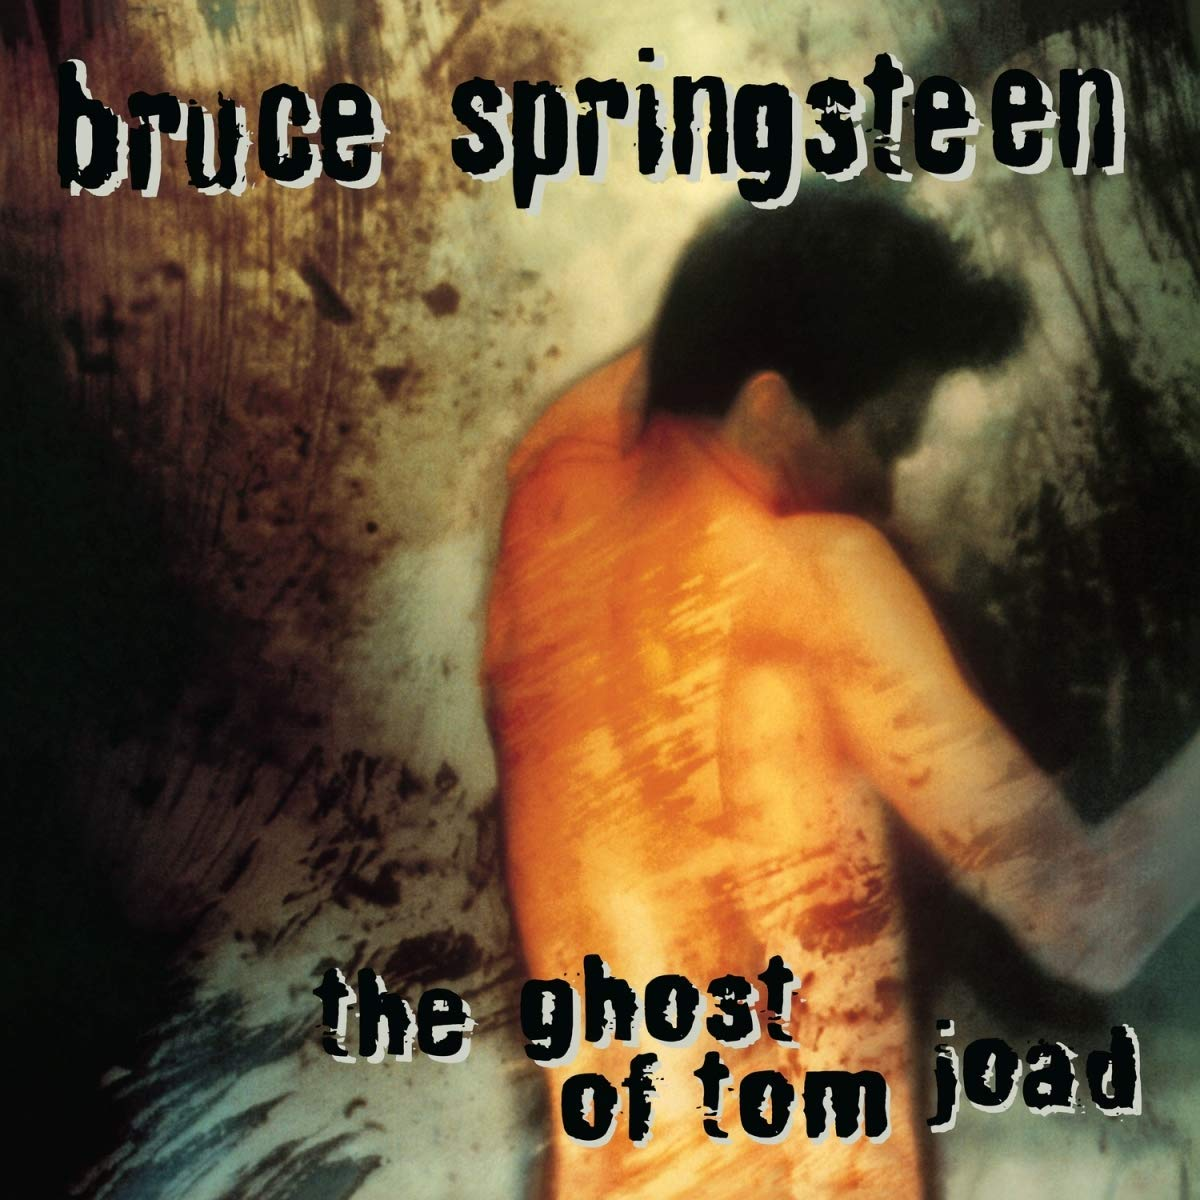 Брюс Спрингстин Bruce Springsteen. The Ghost Of Tom Joad (LP) брюс спрингстин bruce springsteen the human rights broadcast argentina 1988 2 lp